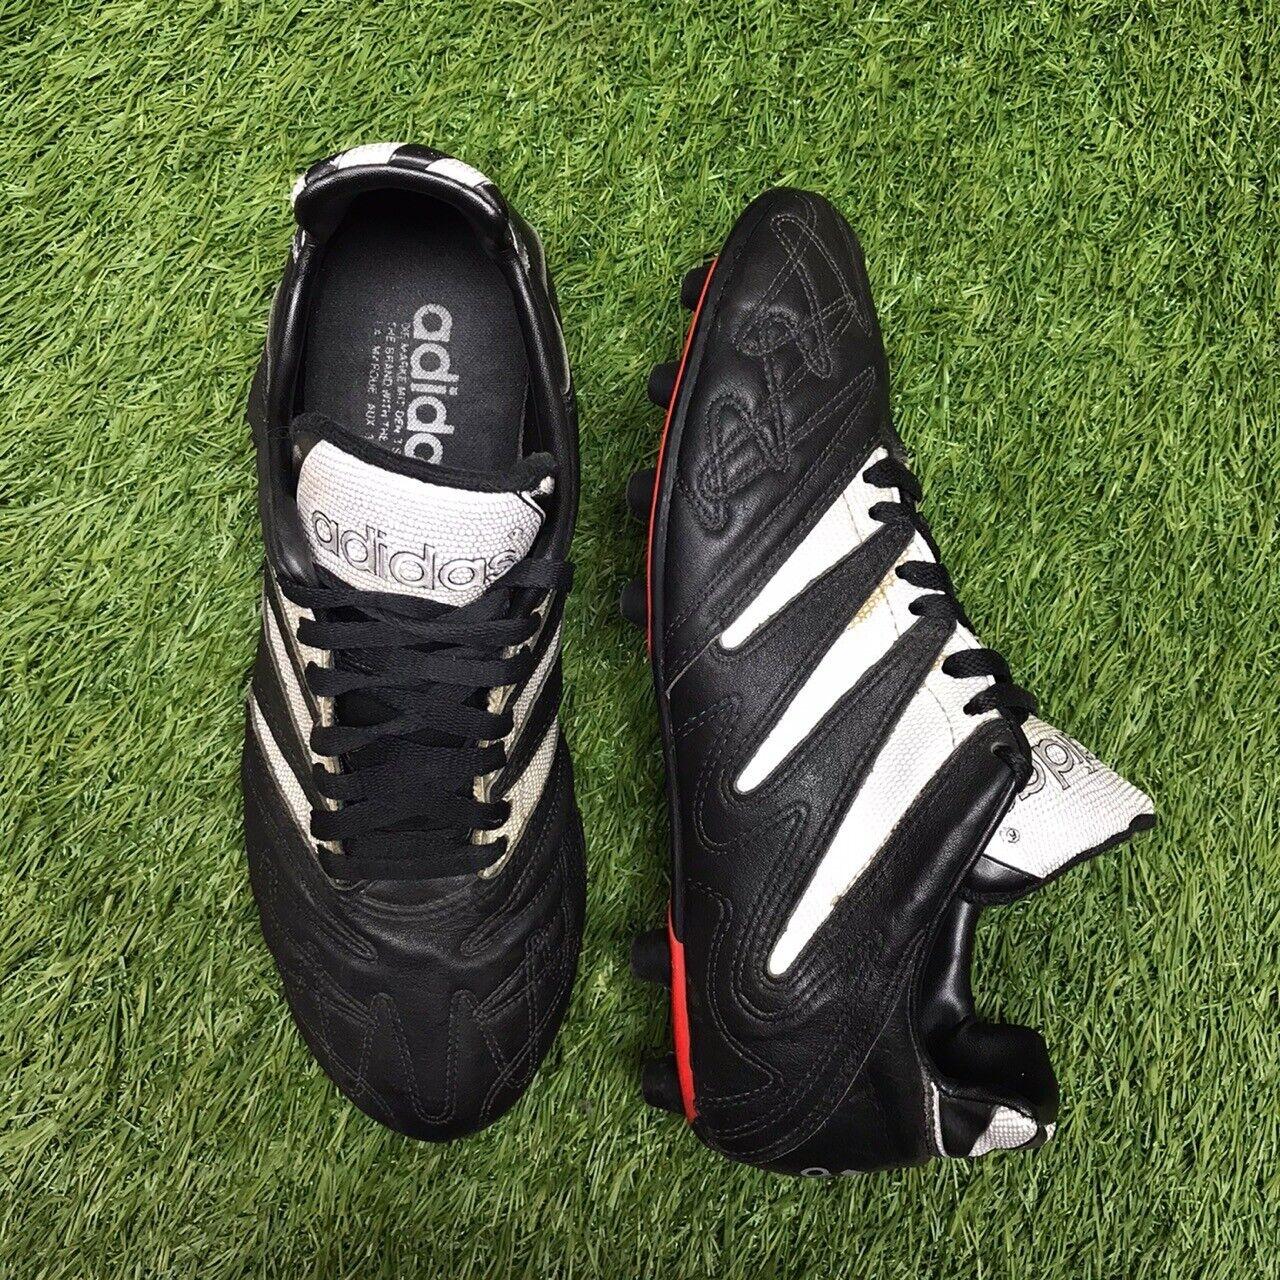 Adidas Questra Finale Liga FG 015290 9 US FIFA World Cup 1994 RARE